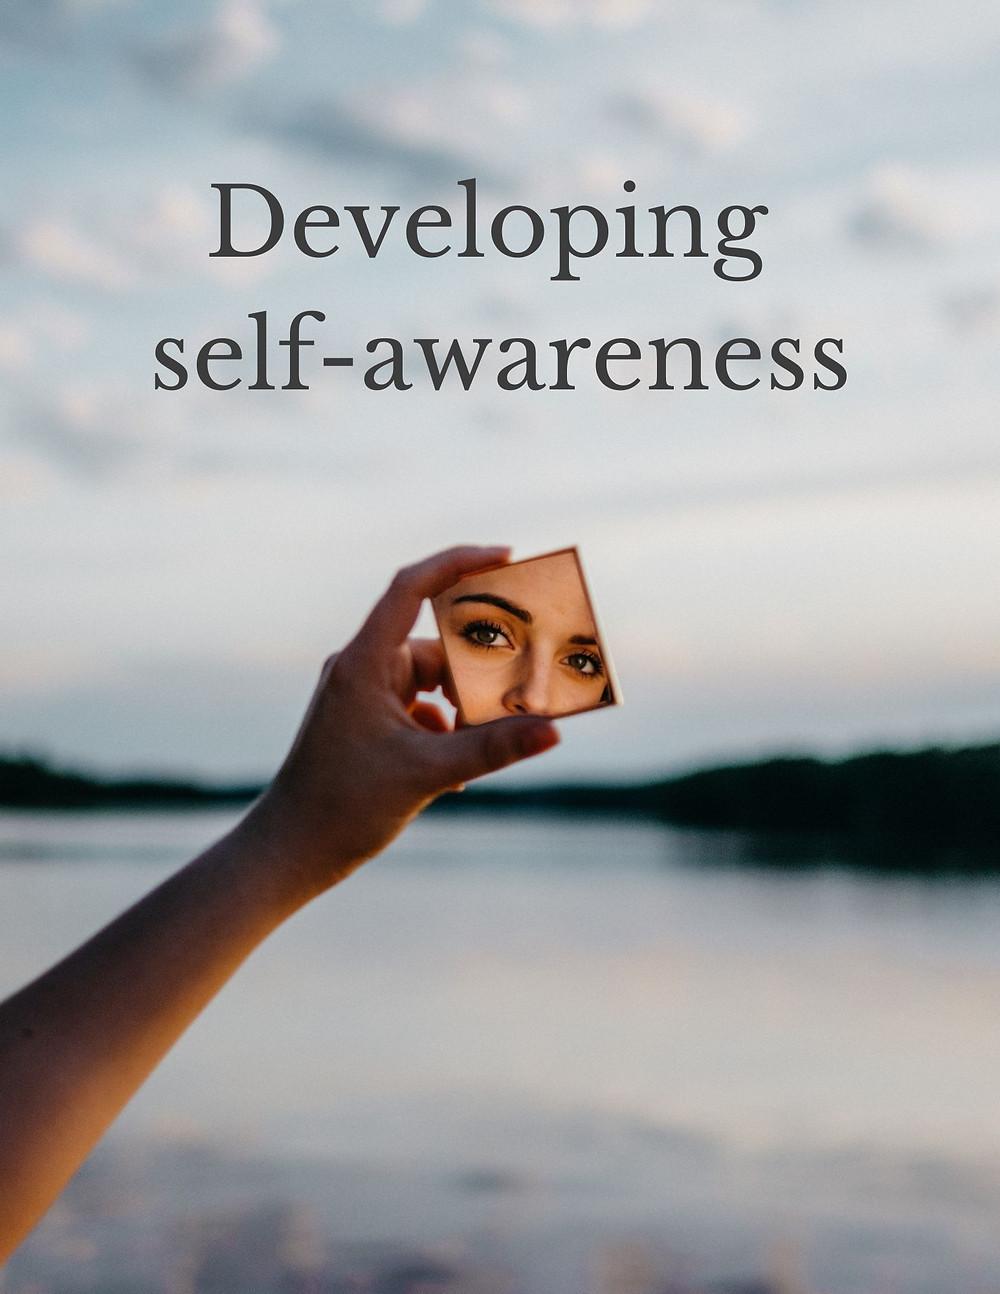 Developing self-awareness